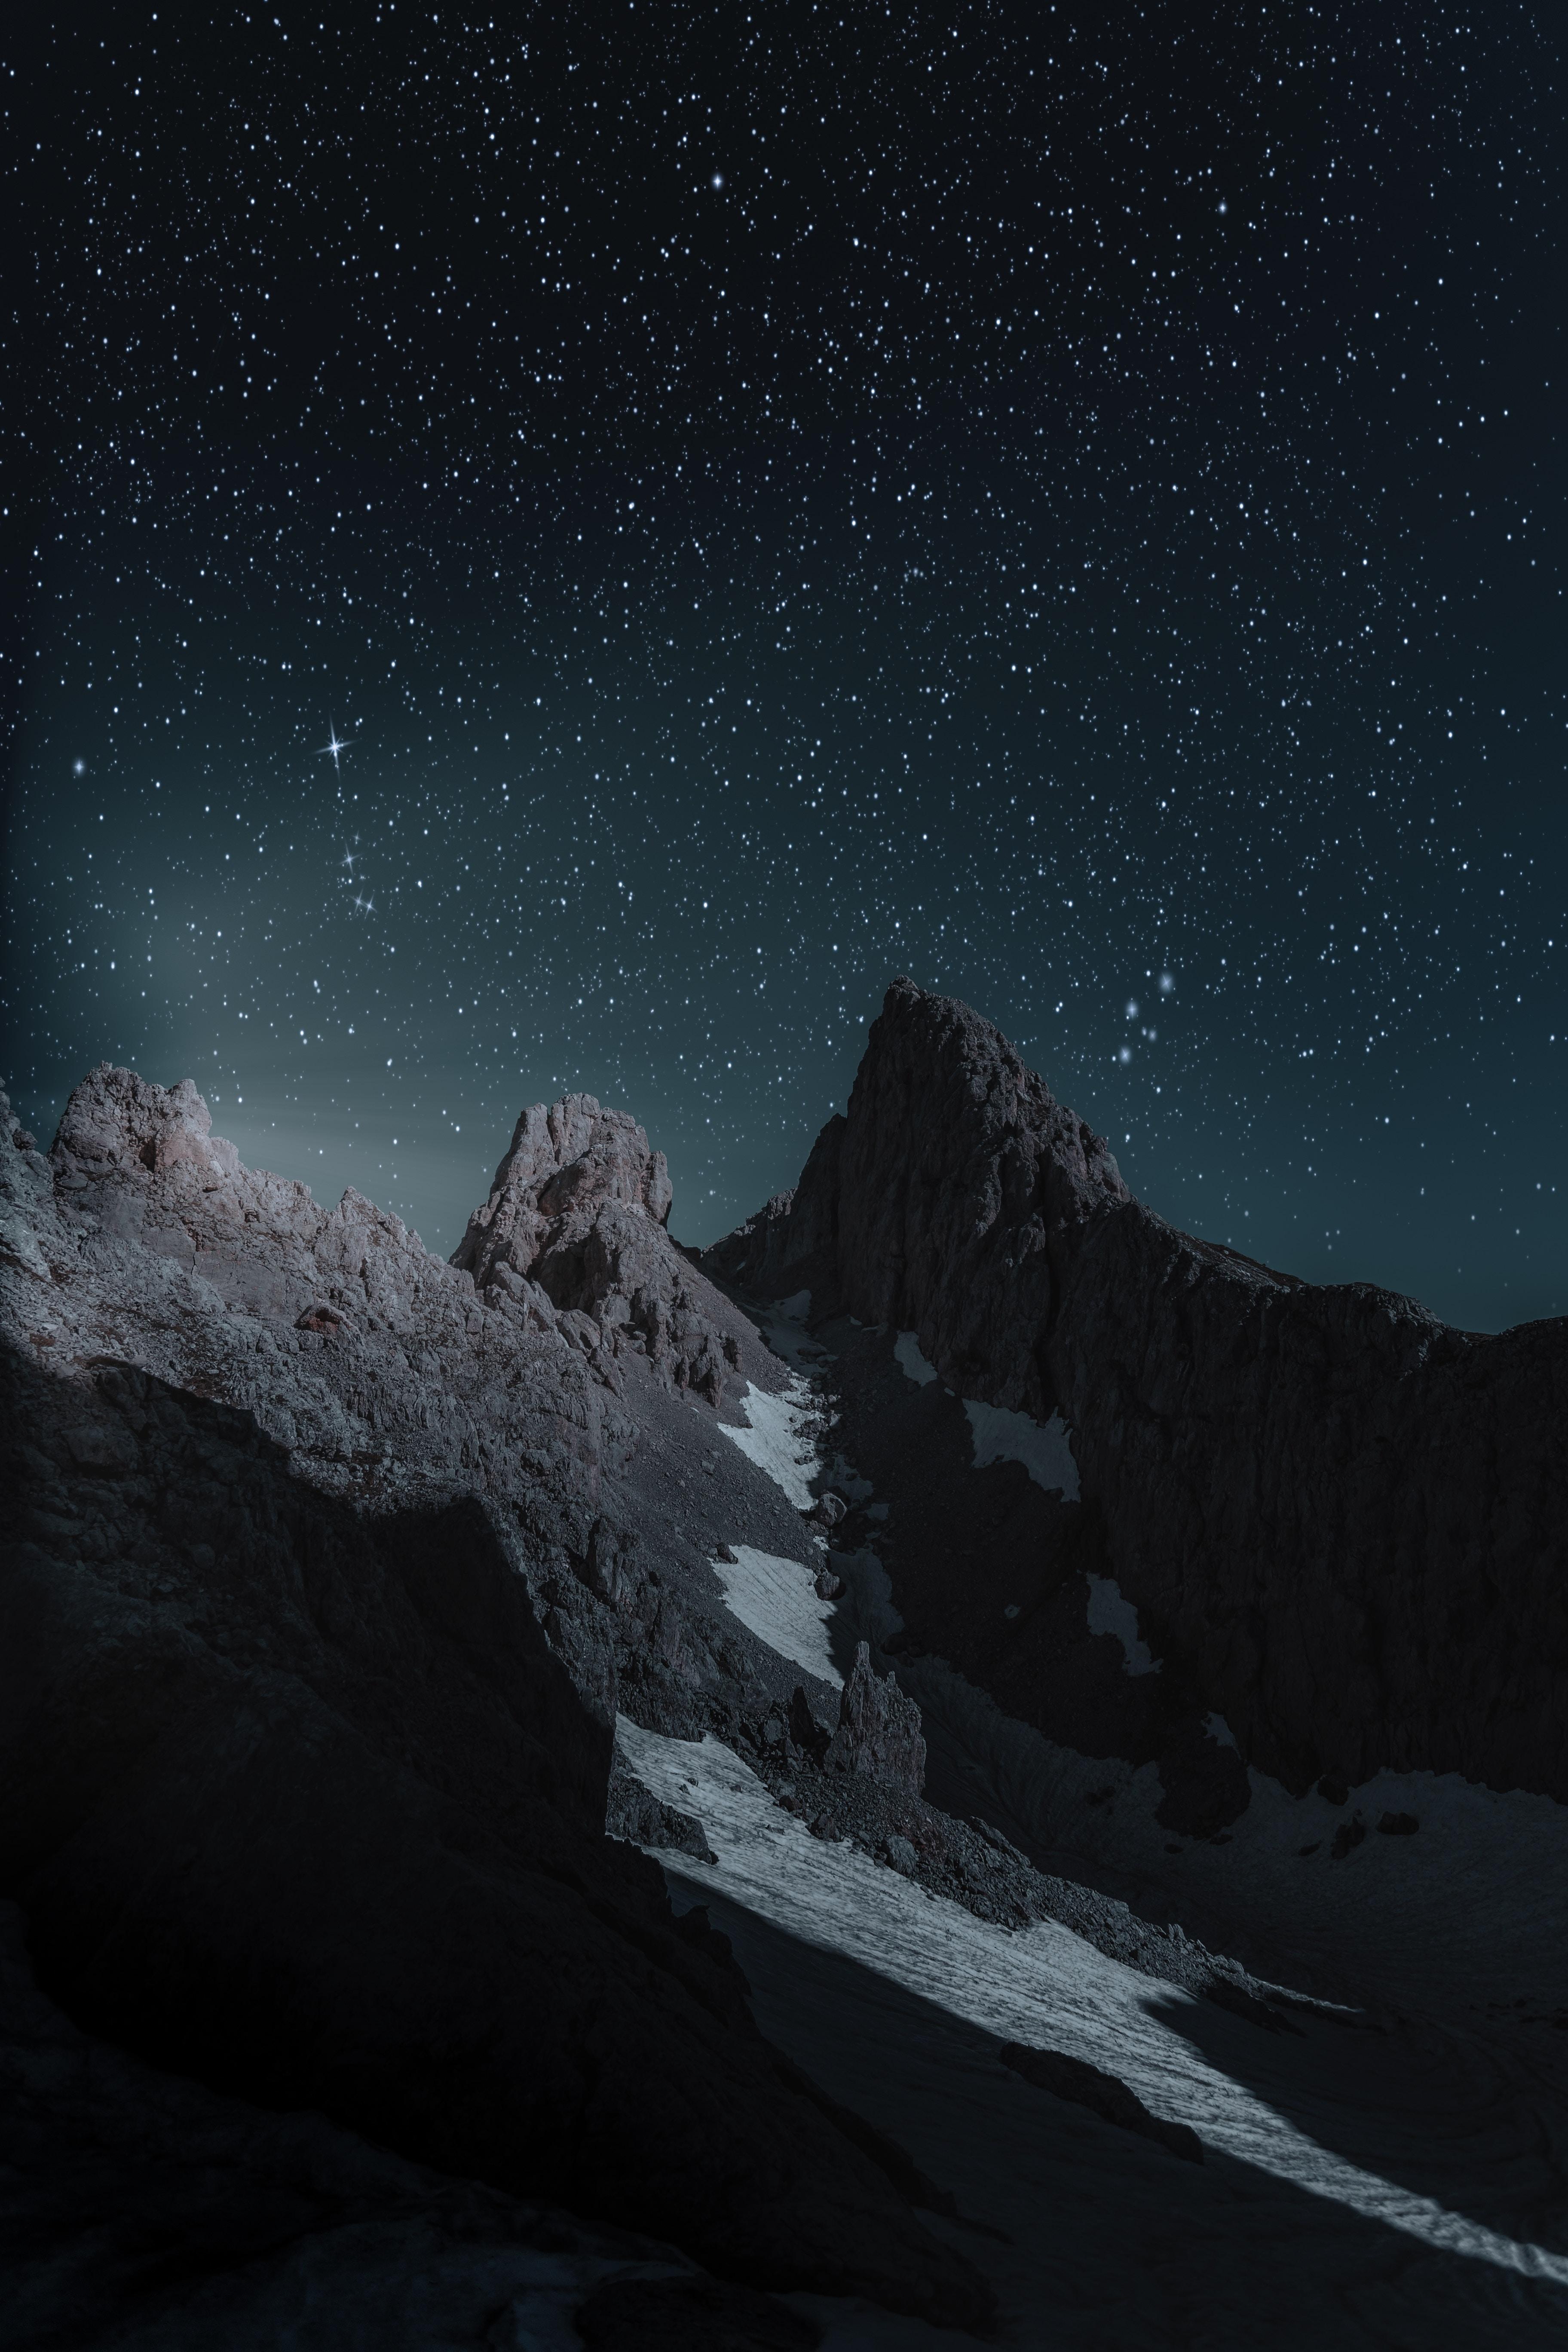 Rocky Mountains Wallpaper Hd 3